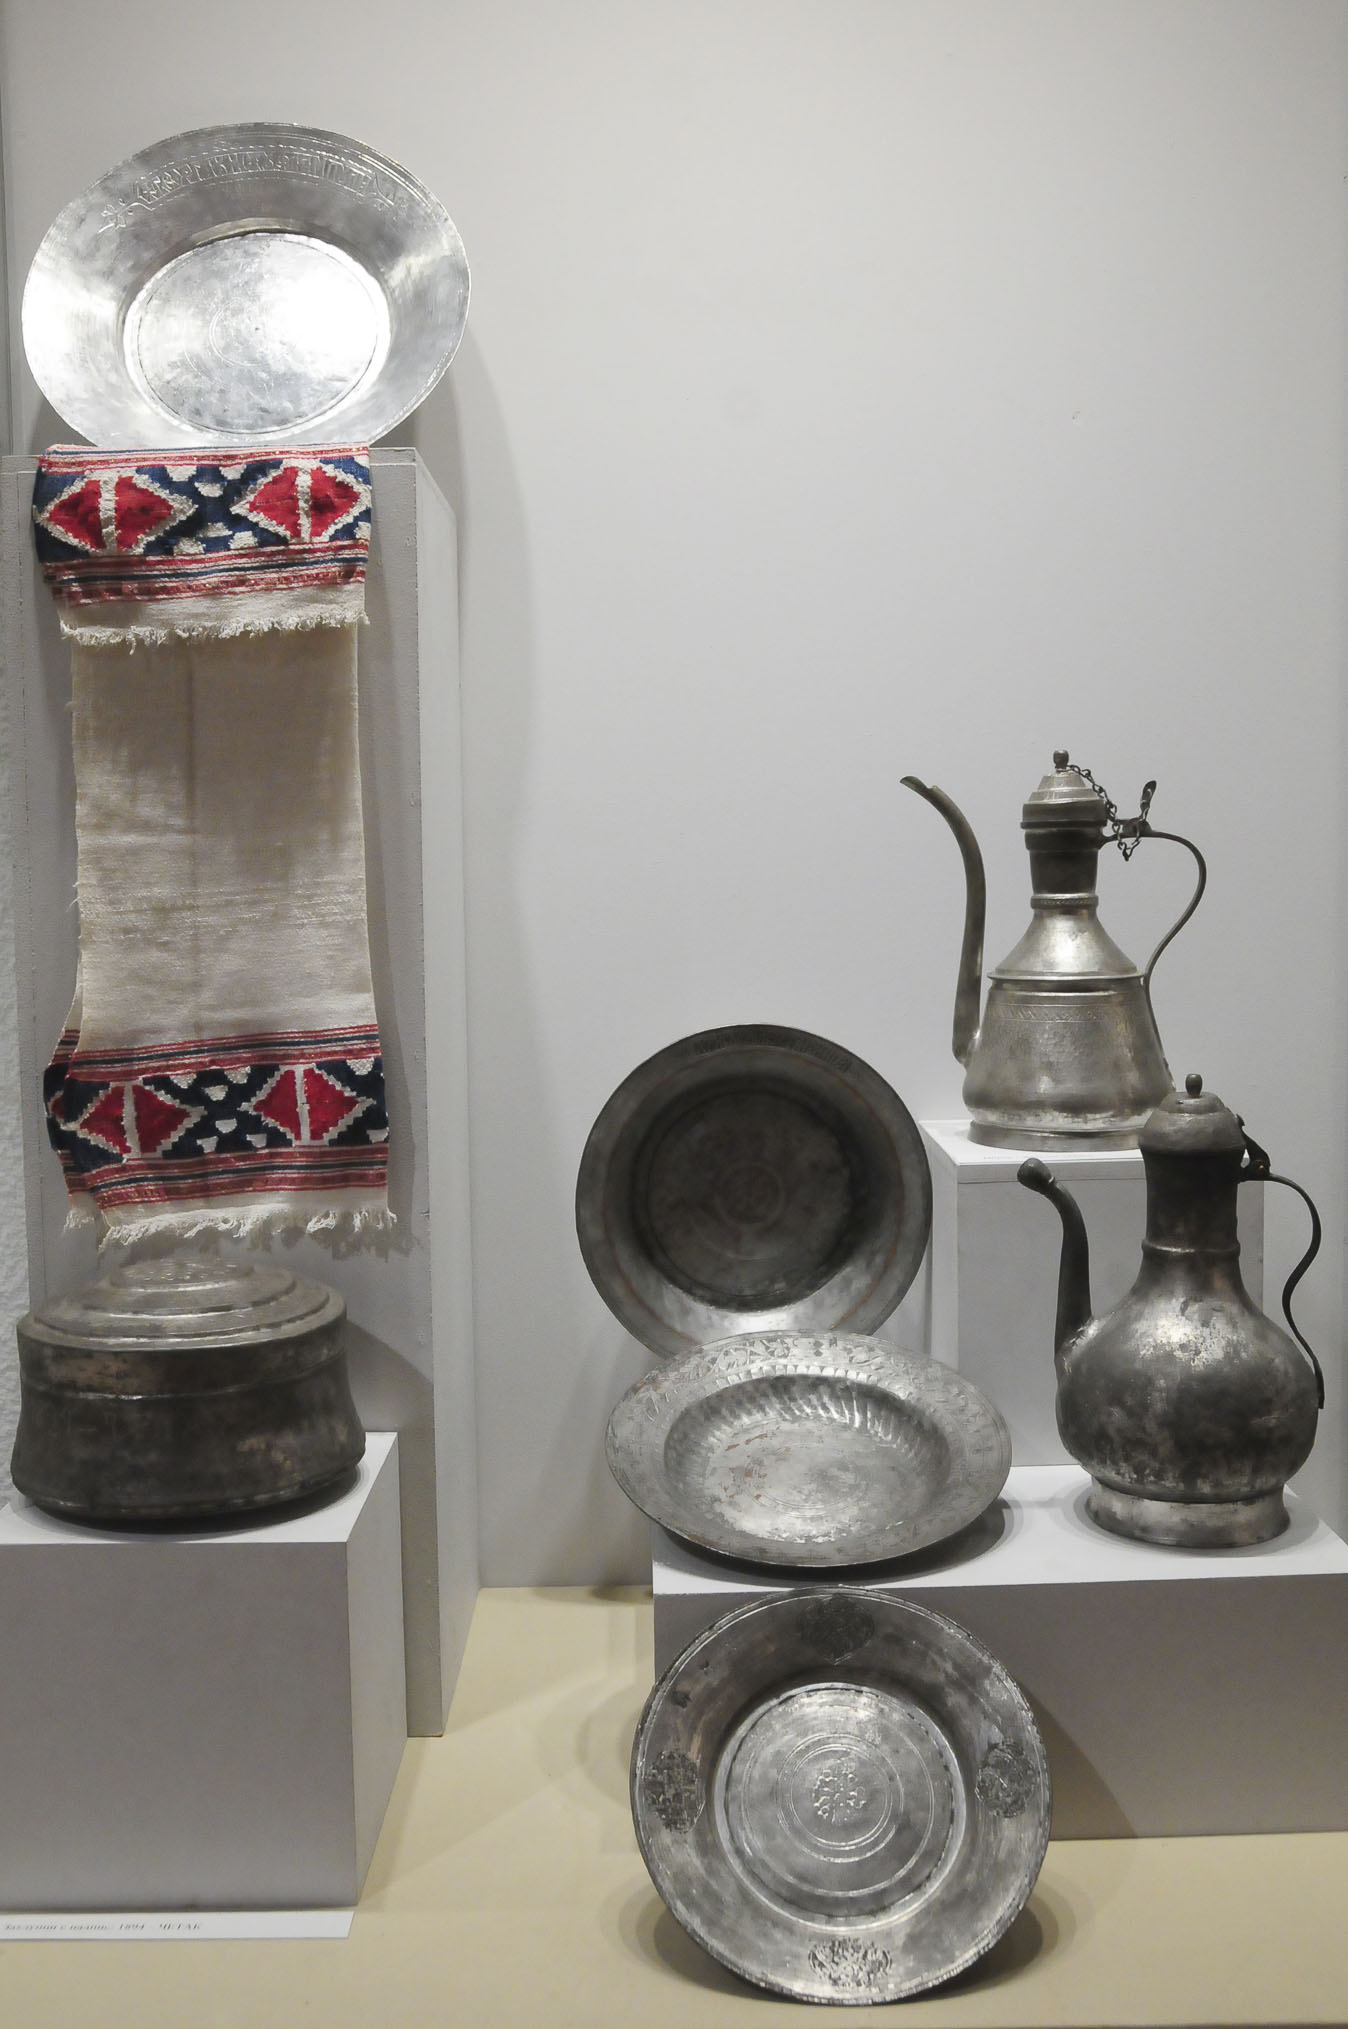 troyan-museum-mednikarstvo-ot-troyanskiq-krai-3